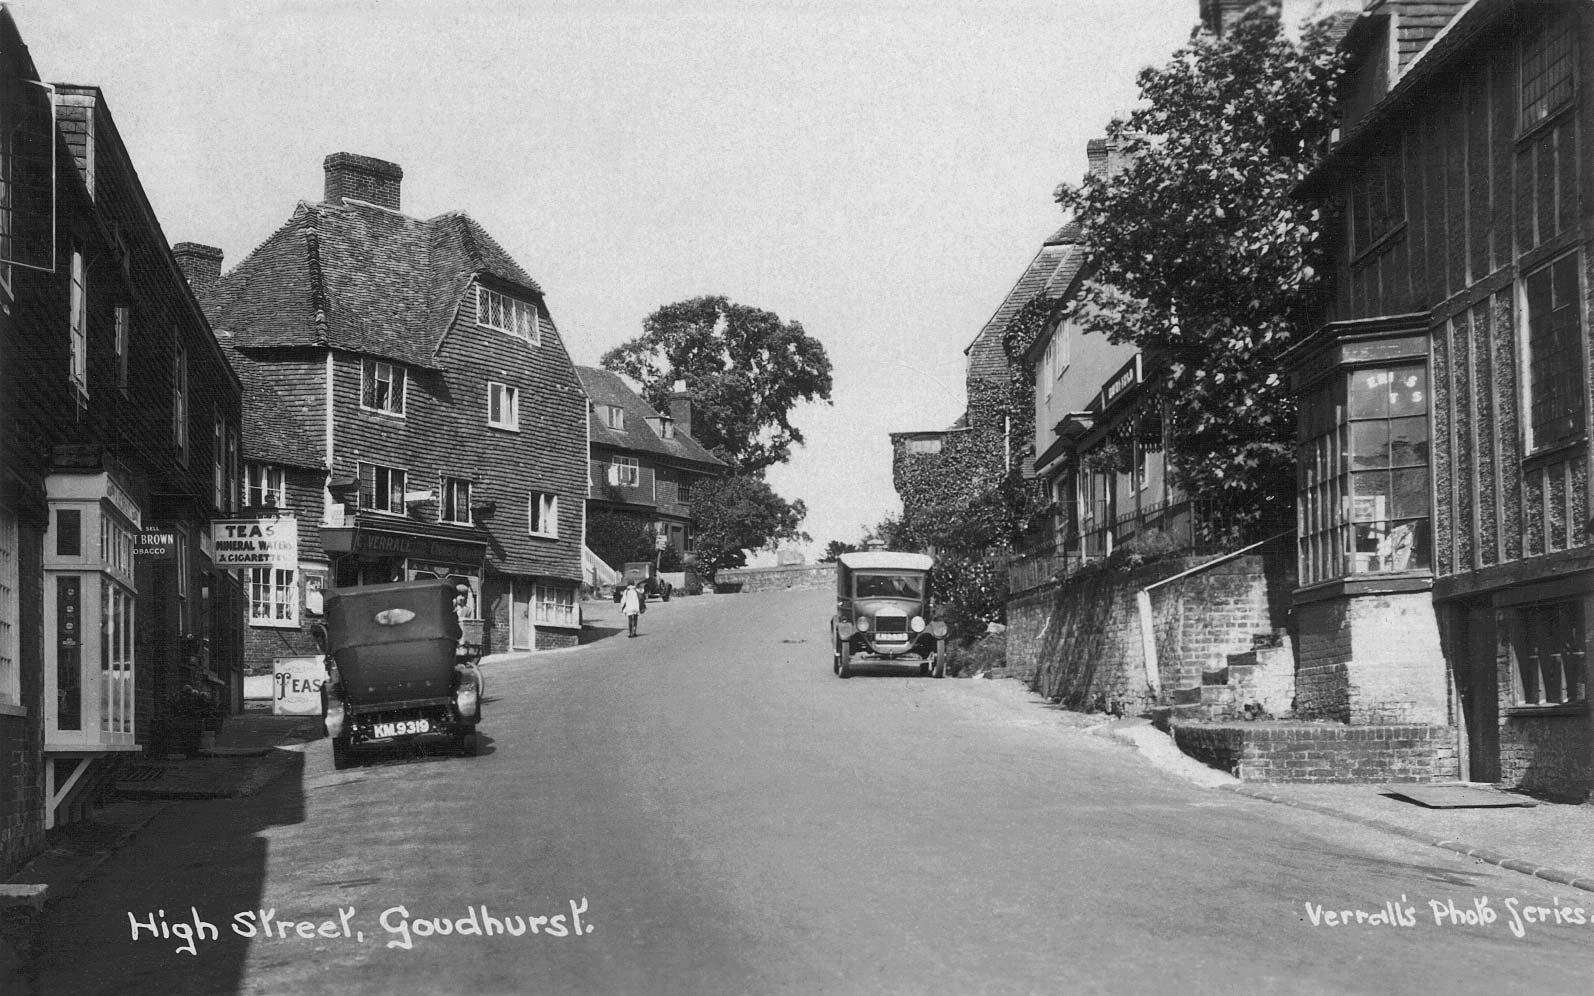 High Street, Goudhurst